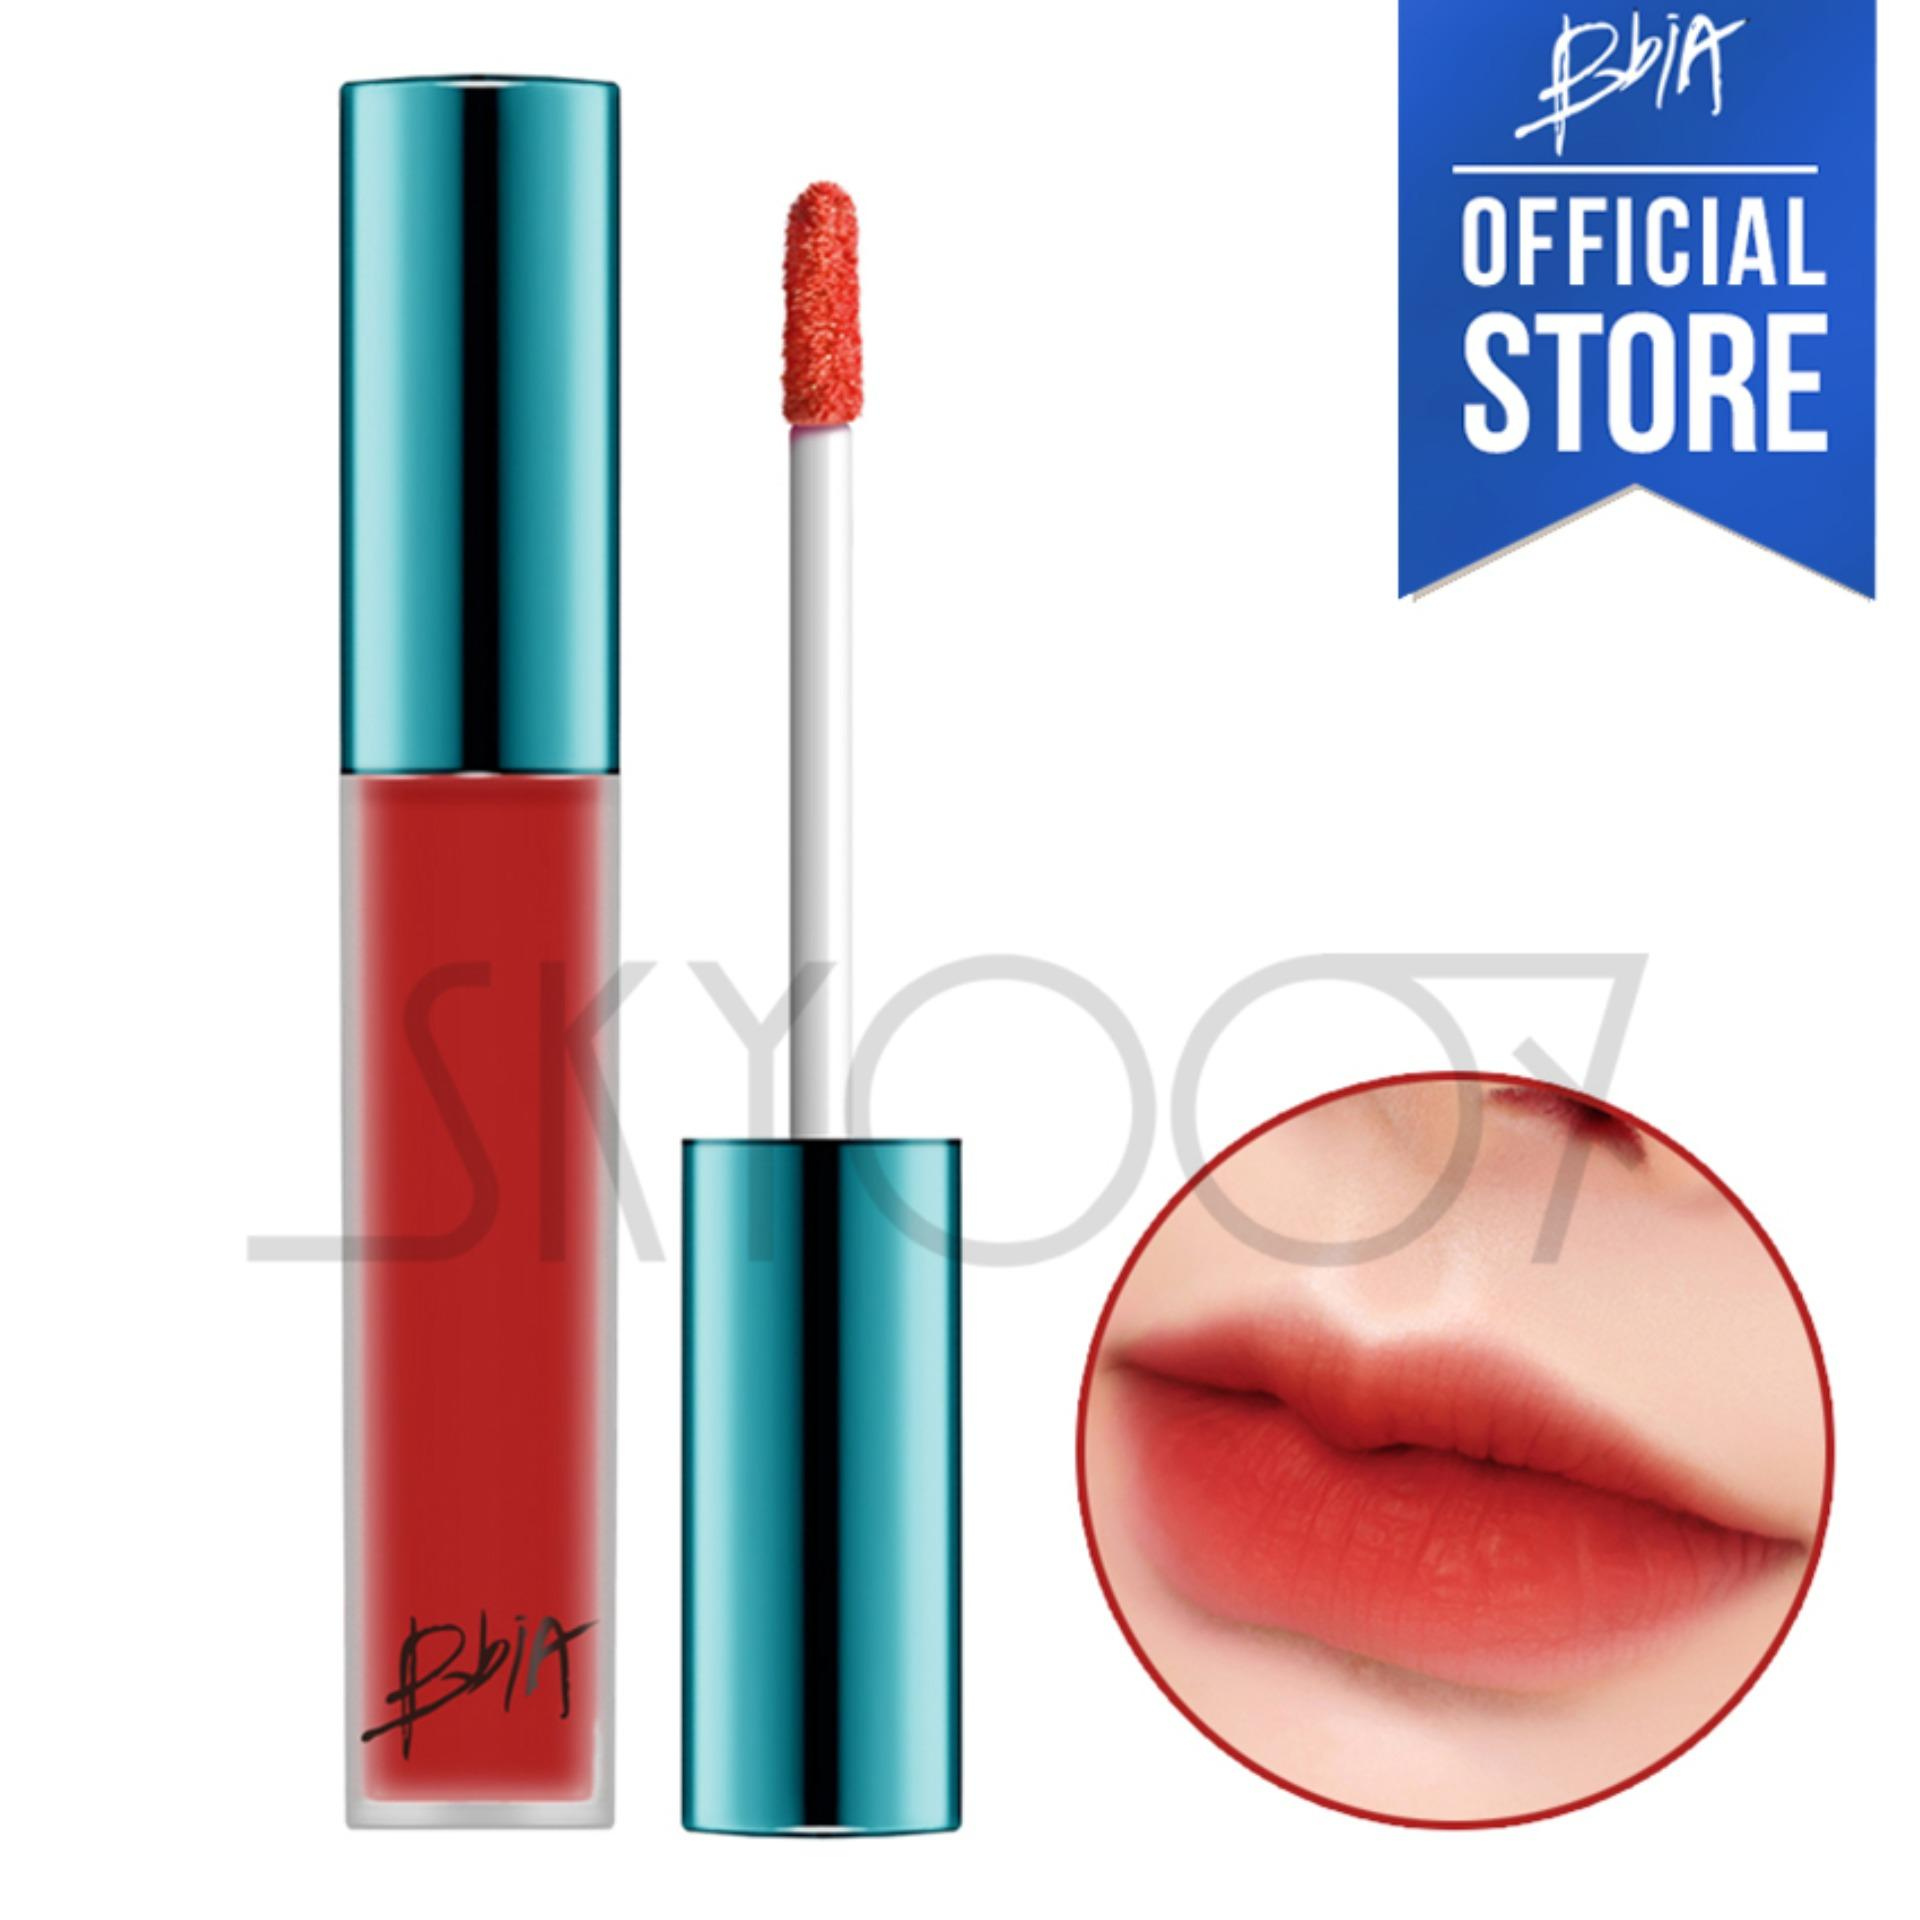 Son kem lì Bbia Last Velvet Lip Tint Version 1 - 04 Extra Mood (Màu đỏ) nhập khẩu